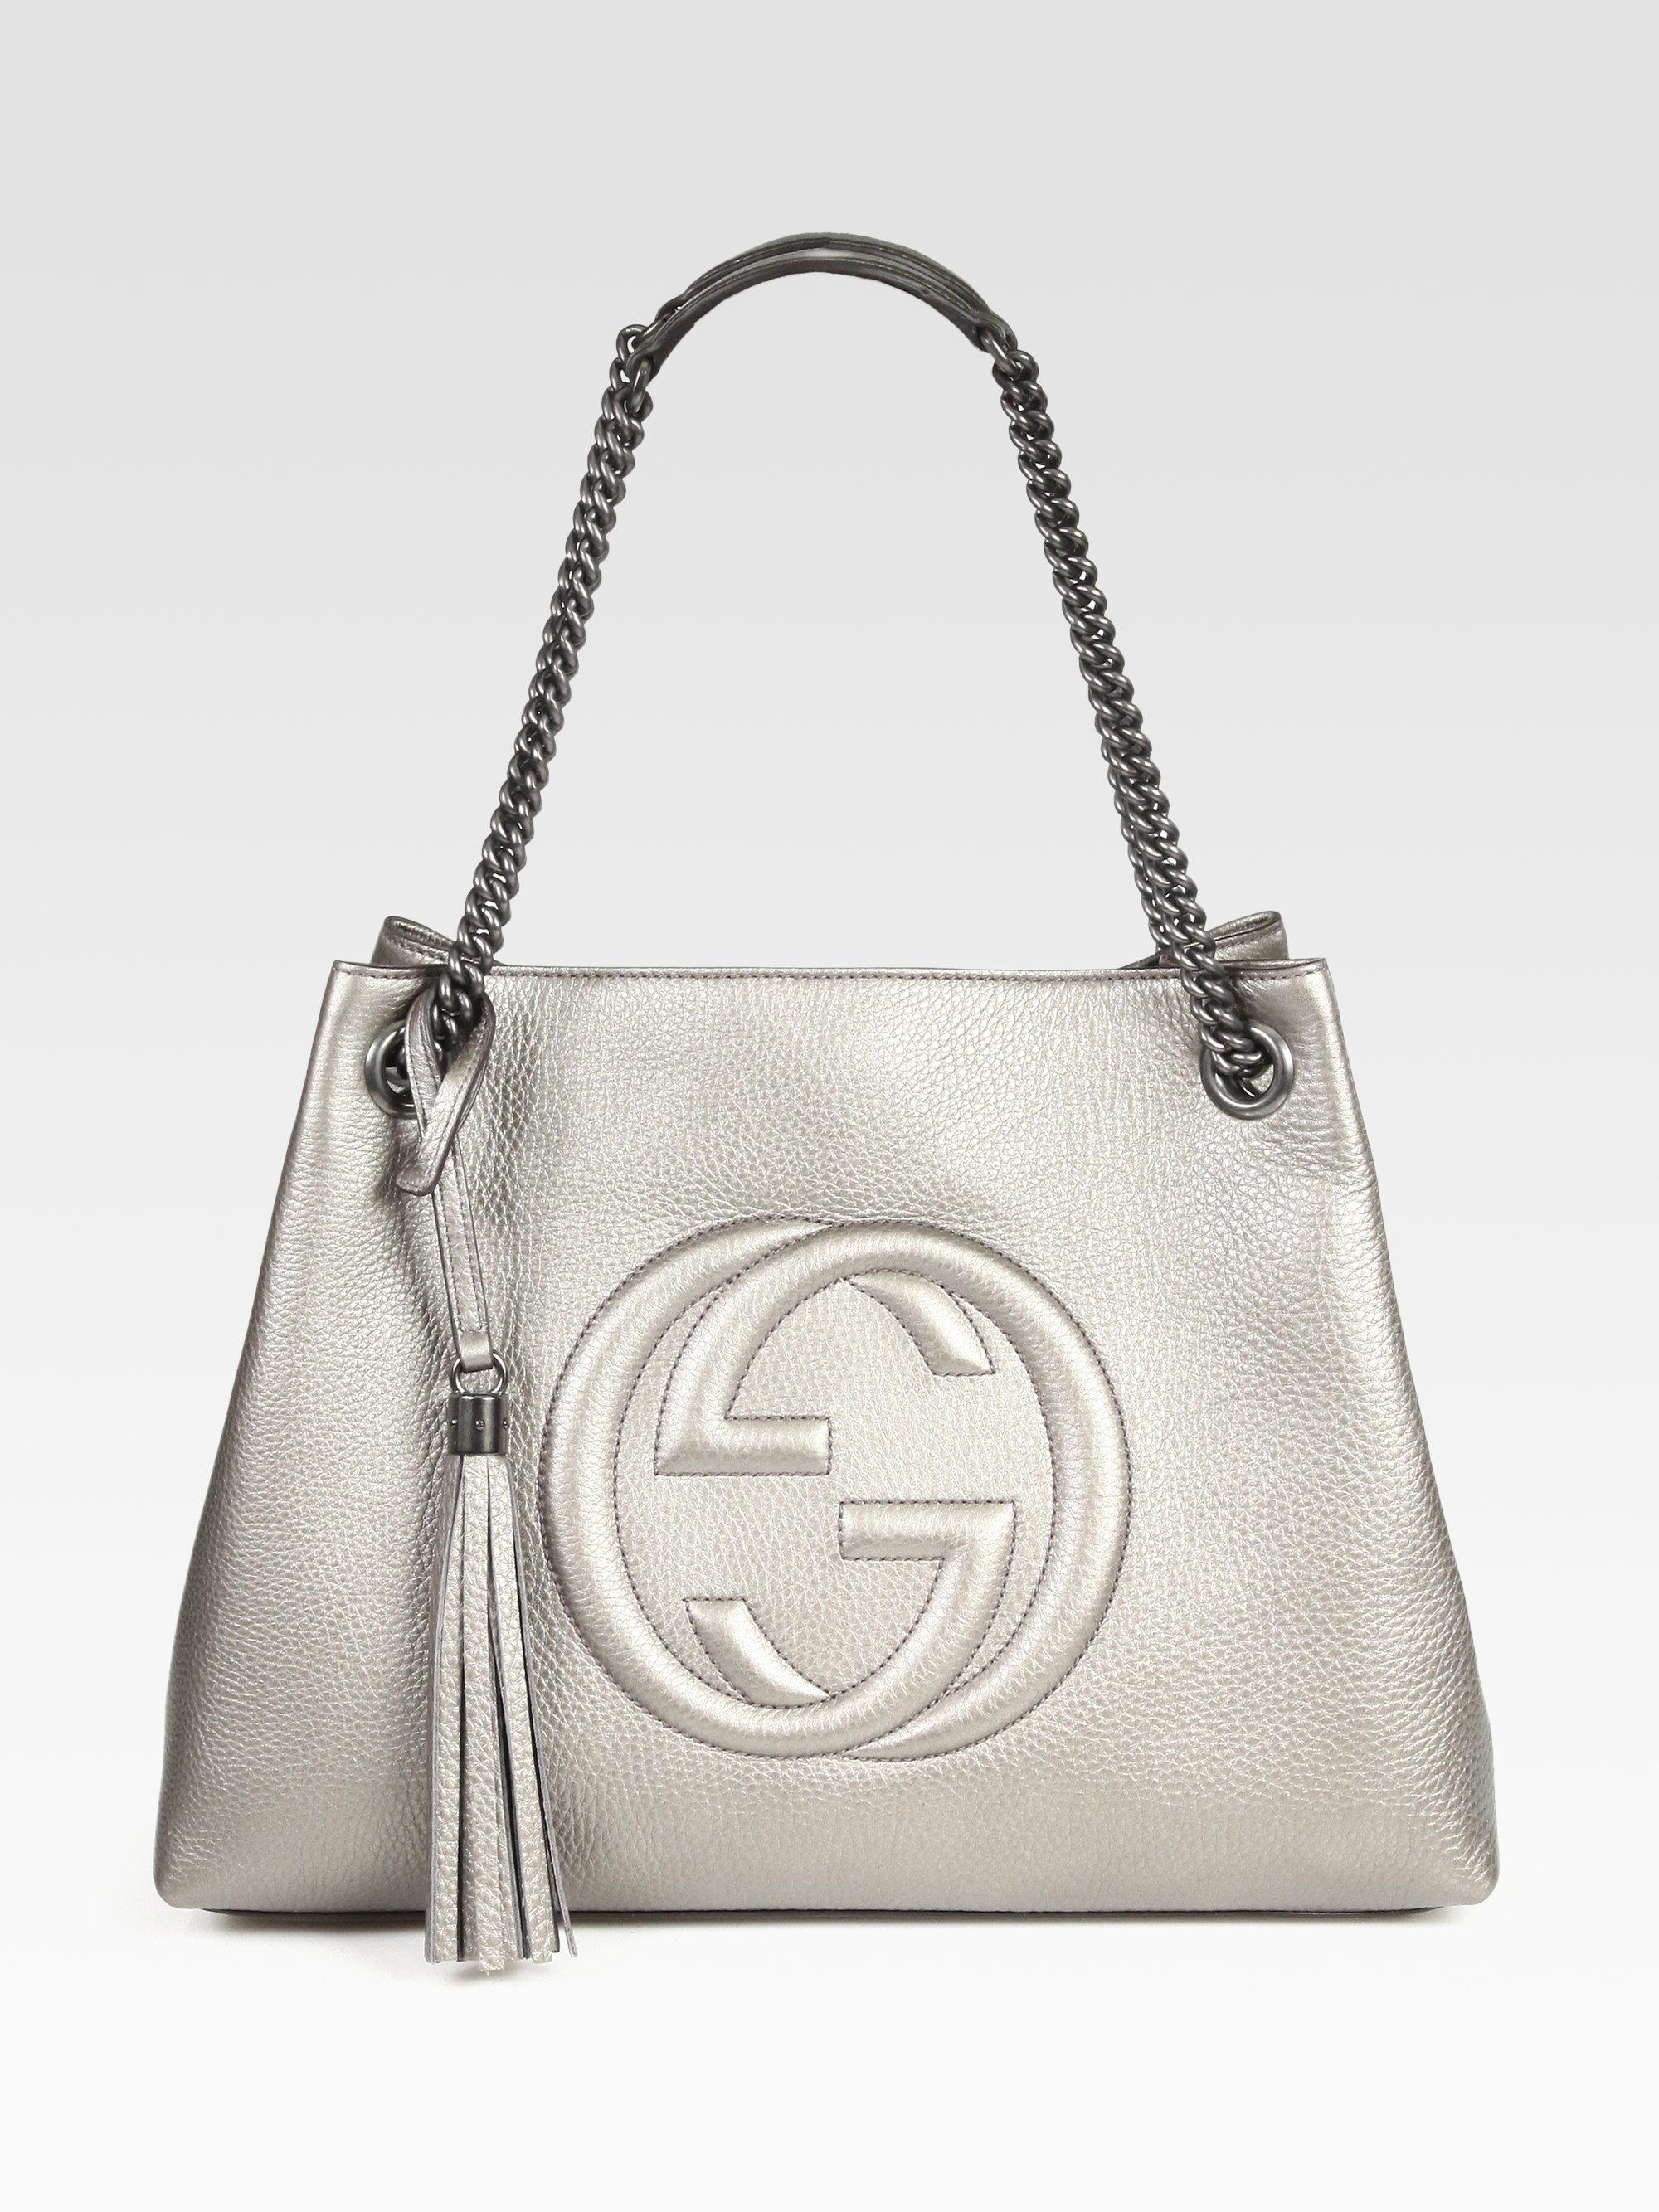 bfbcc780ffb Lyst - Gucci Soho Leather Shoulder Bag in Metallic